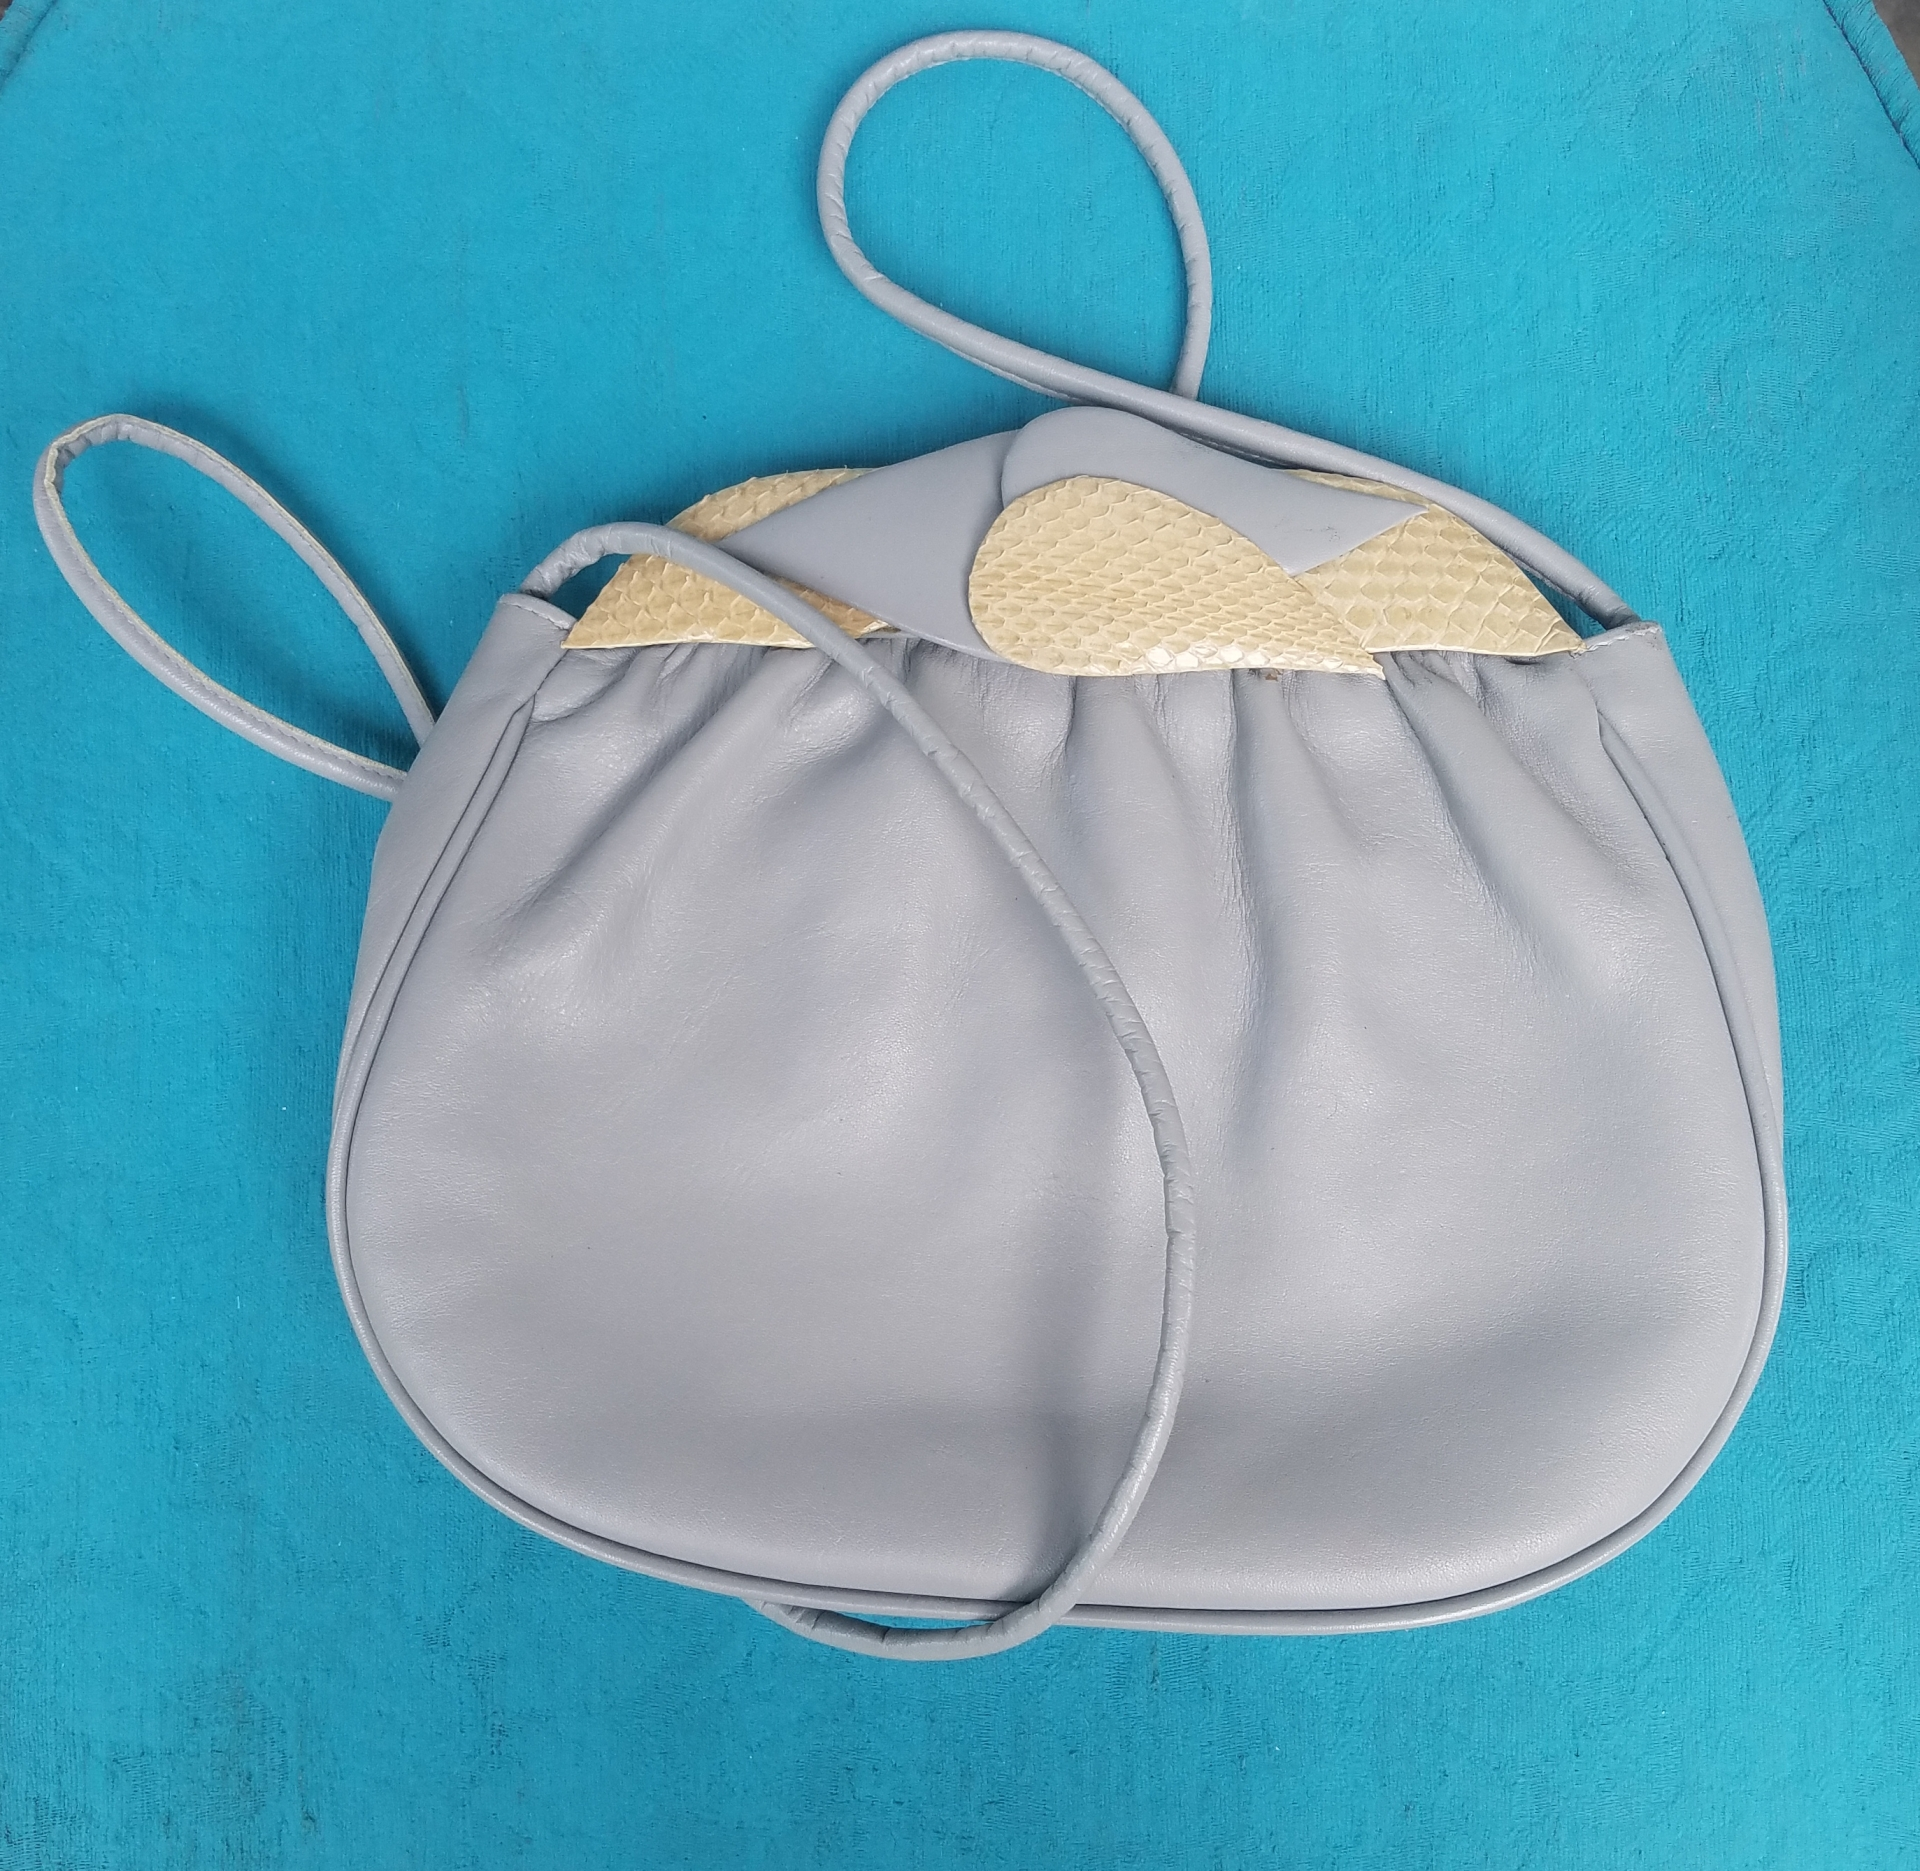 Vintage Handbag collection iwannabealady.wordpress.com